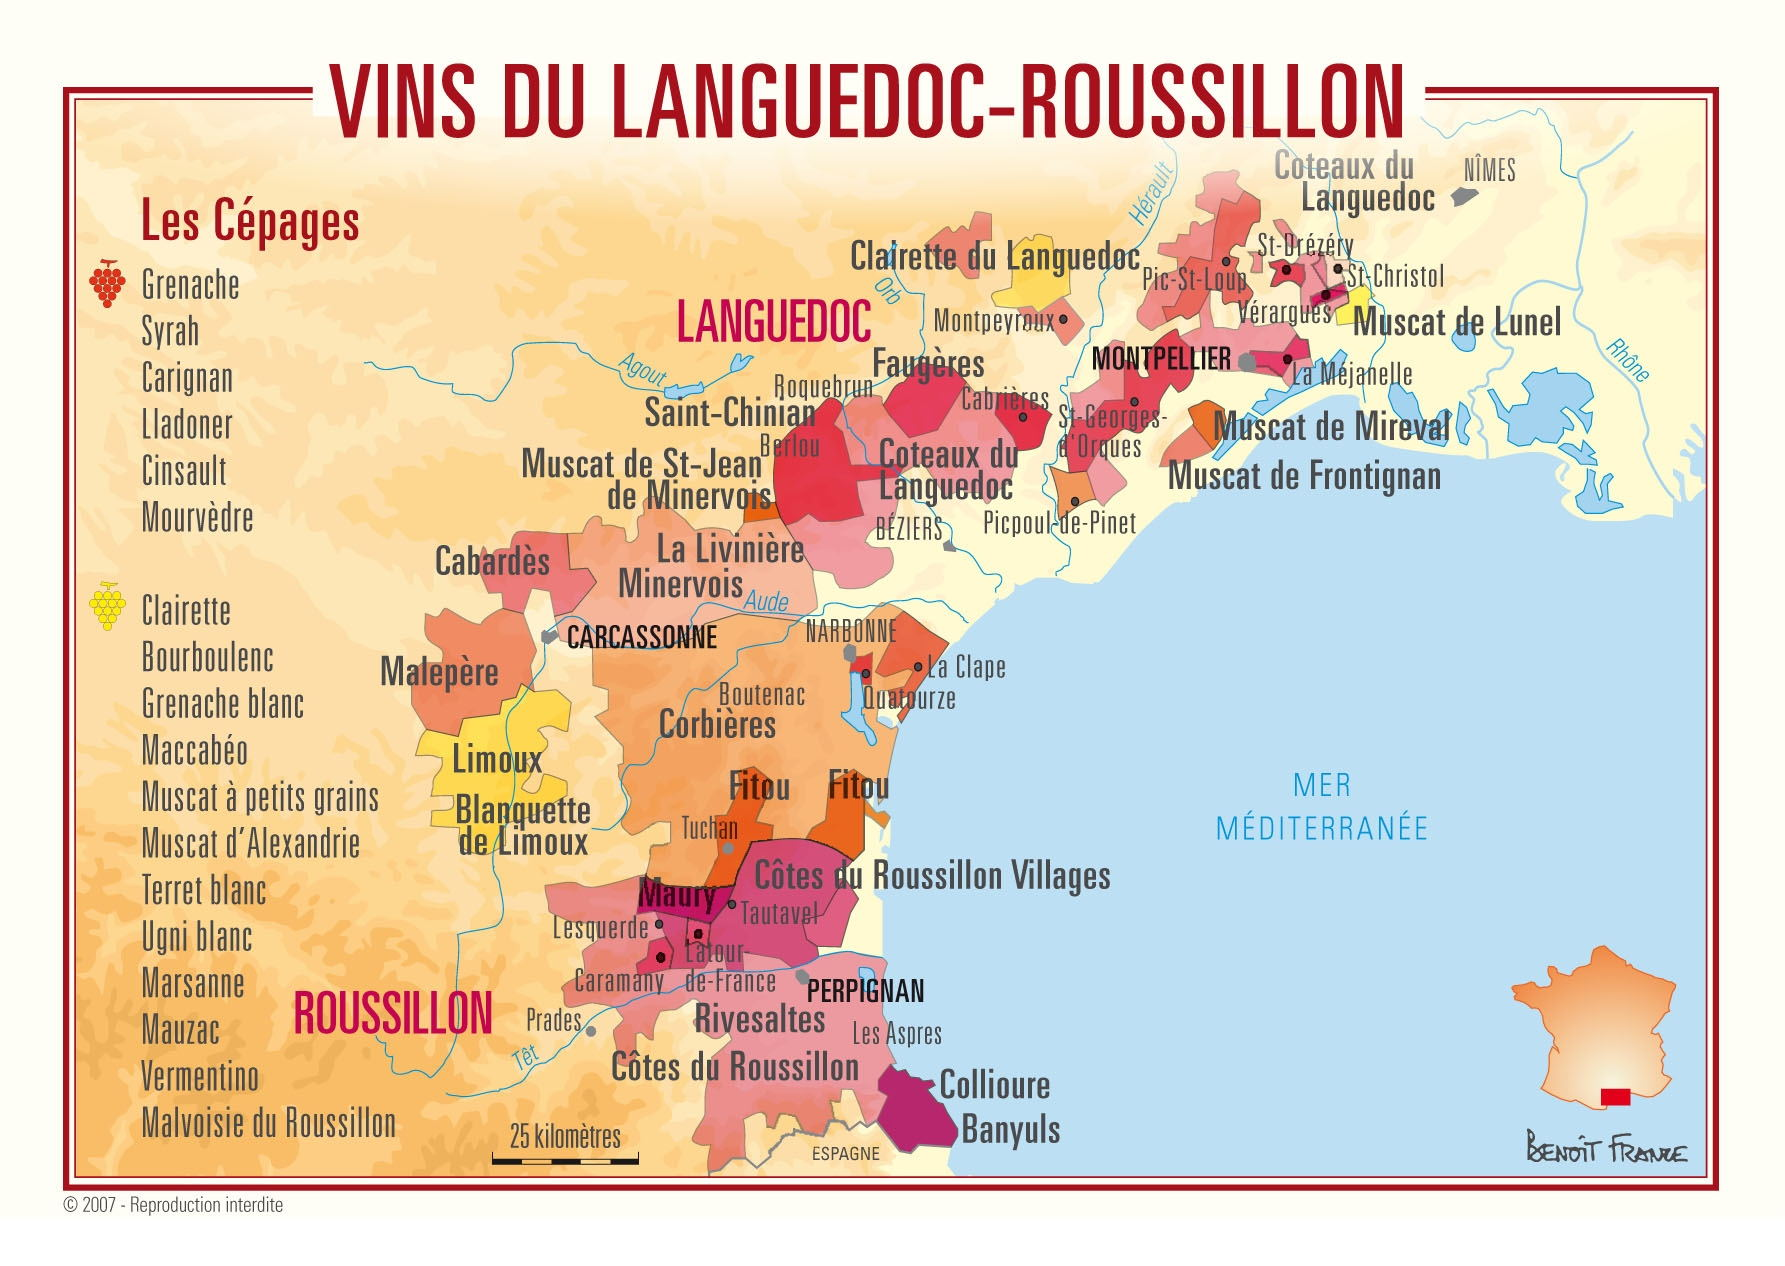 Languedoc-Rousillon-map-by-bentoit-france.jpg